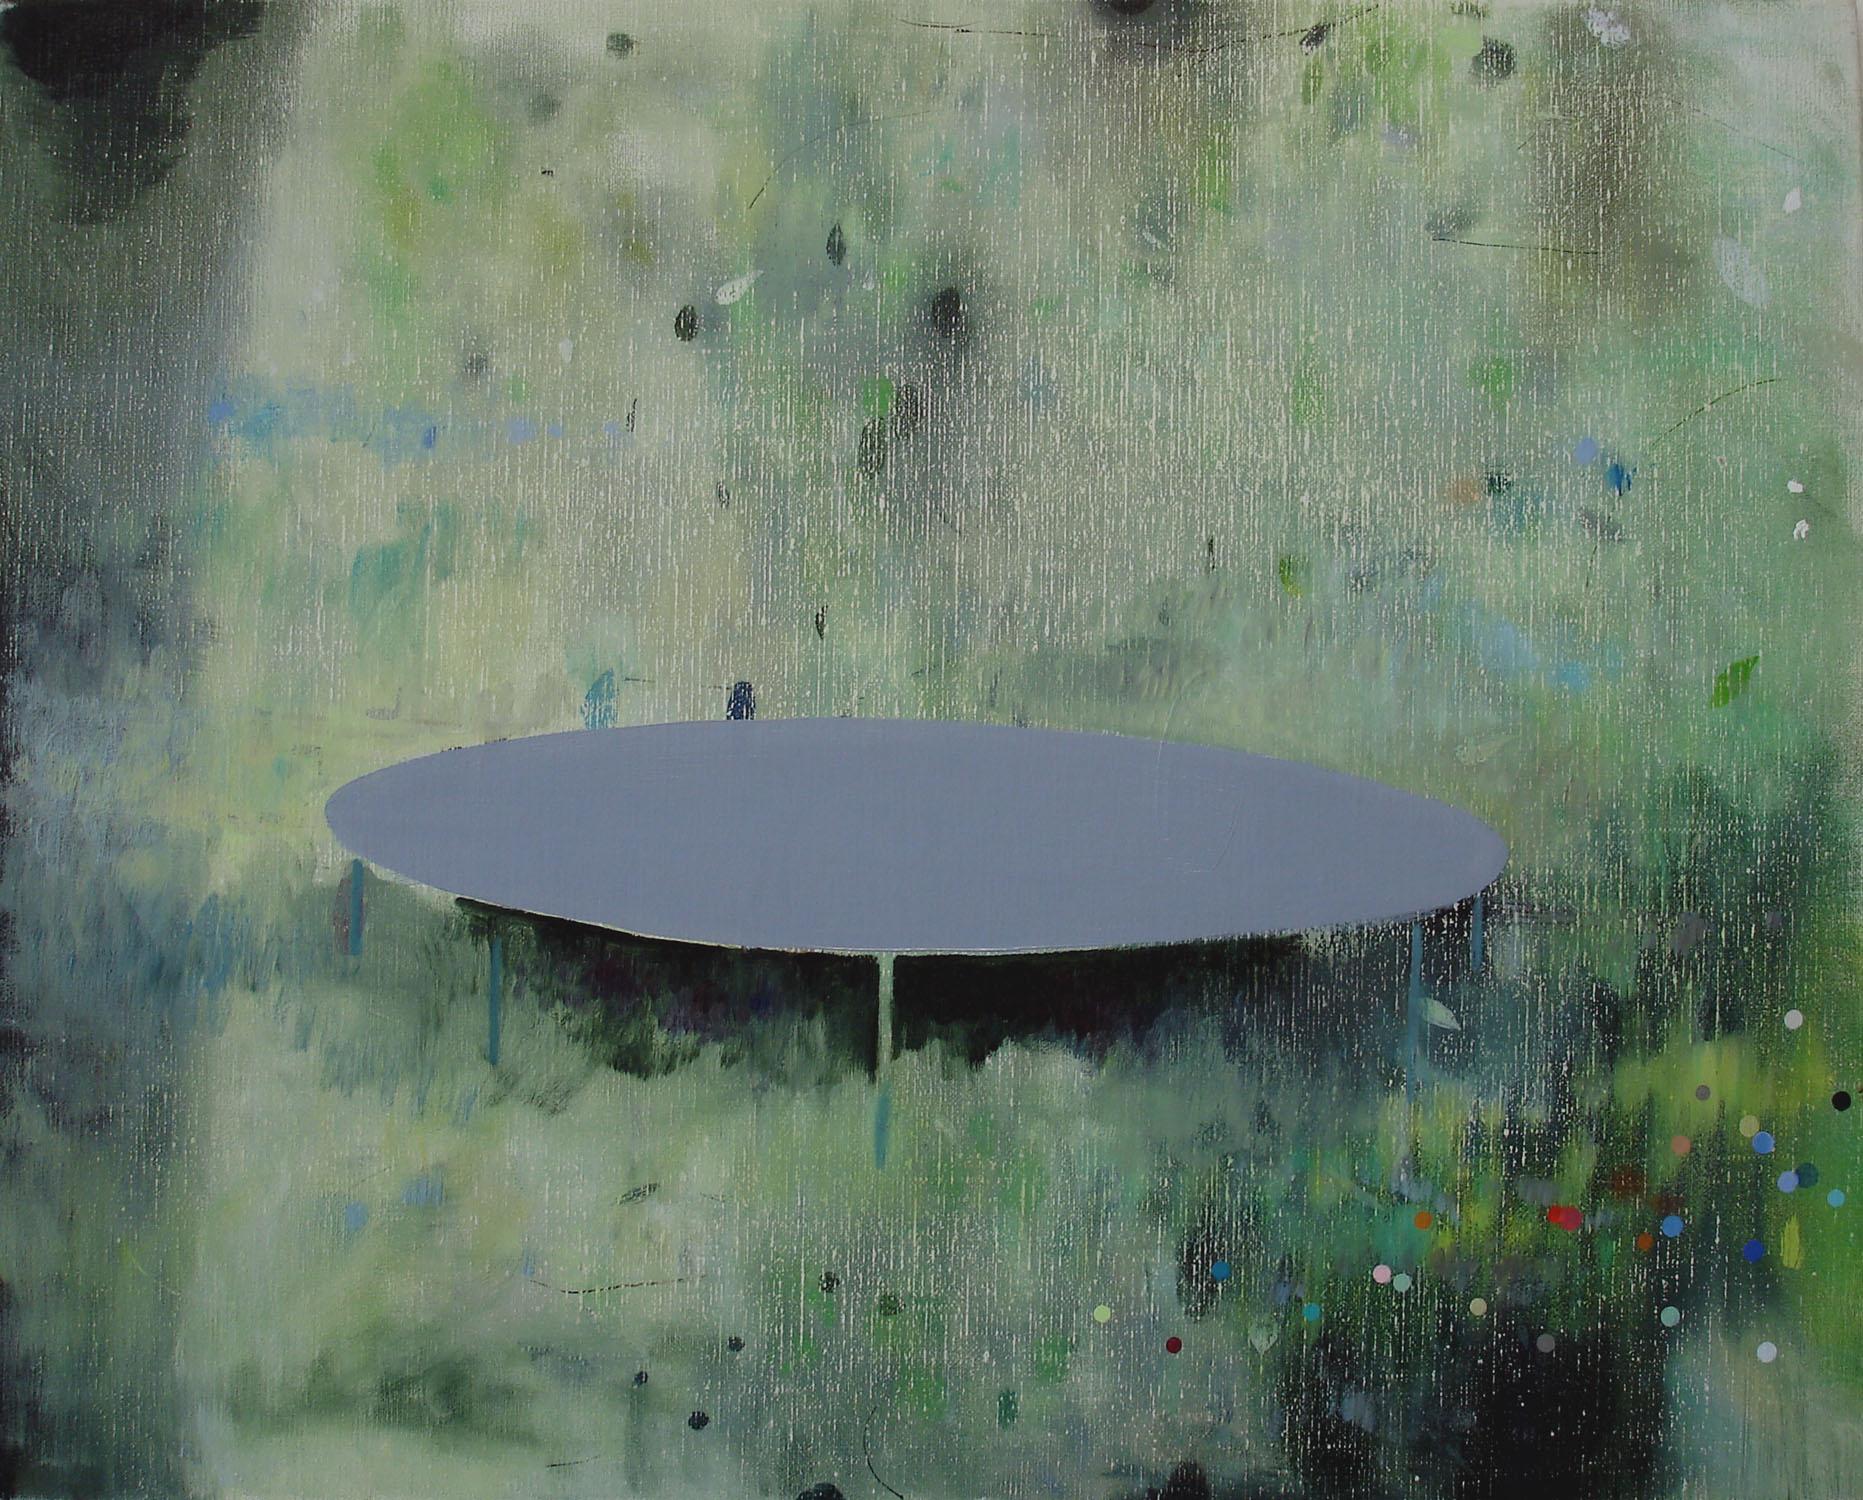 Trampoline    2010, oil on canvas, 40 x 50cm